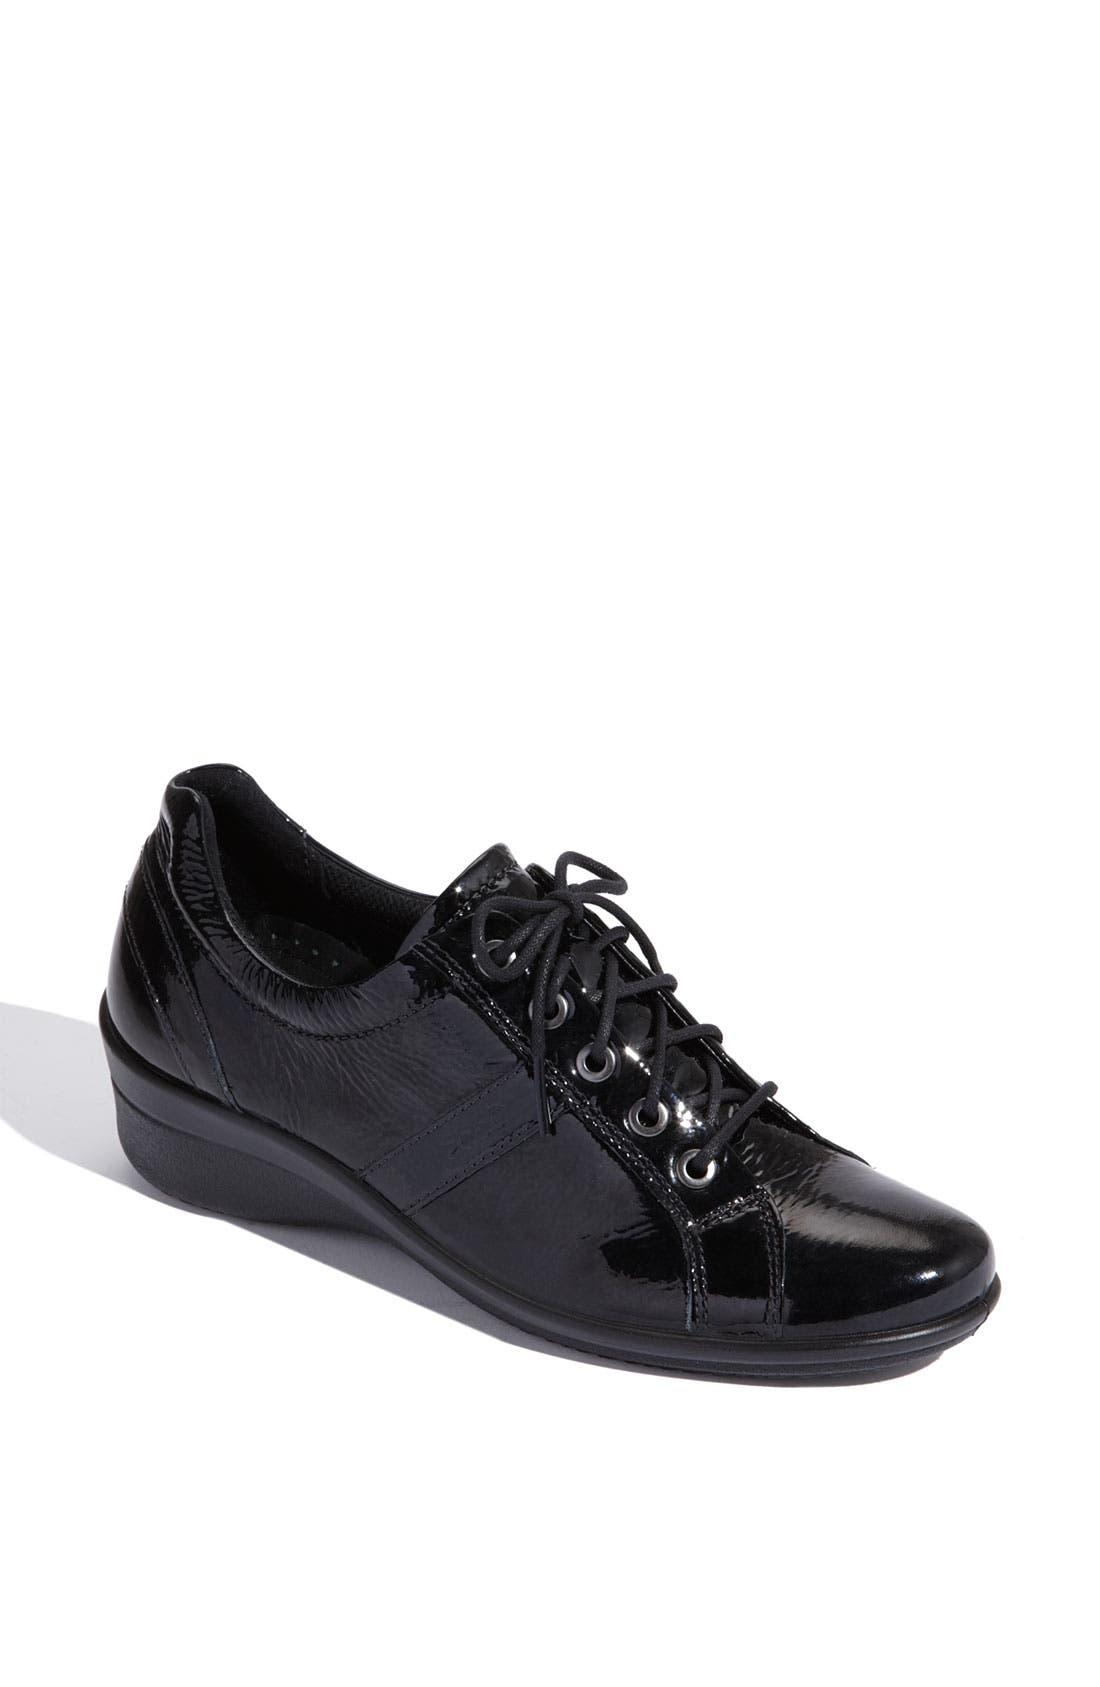 Alternate Image 1 Selected - ECCO 'Corse Tie' Sneaker